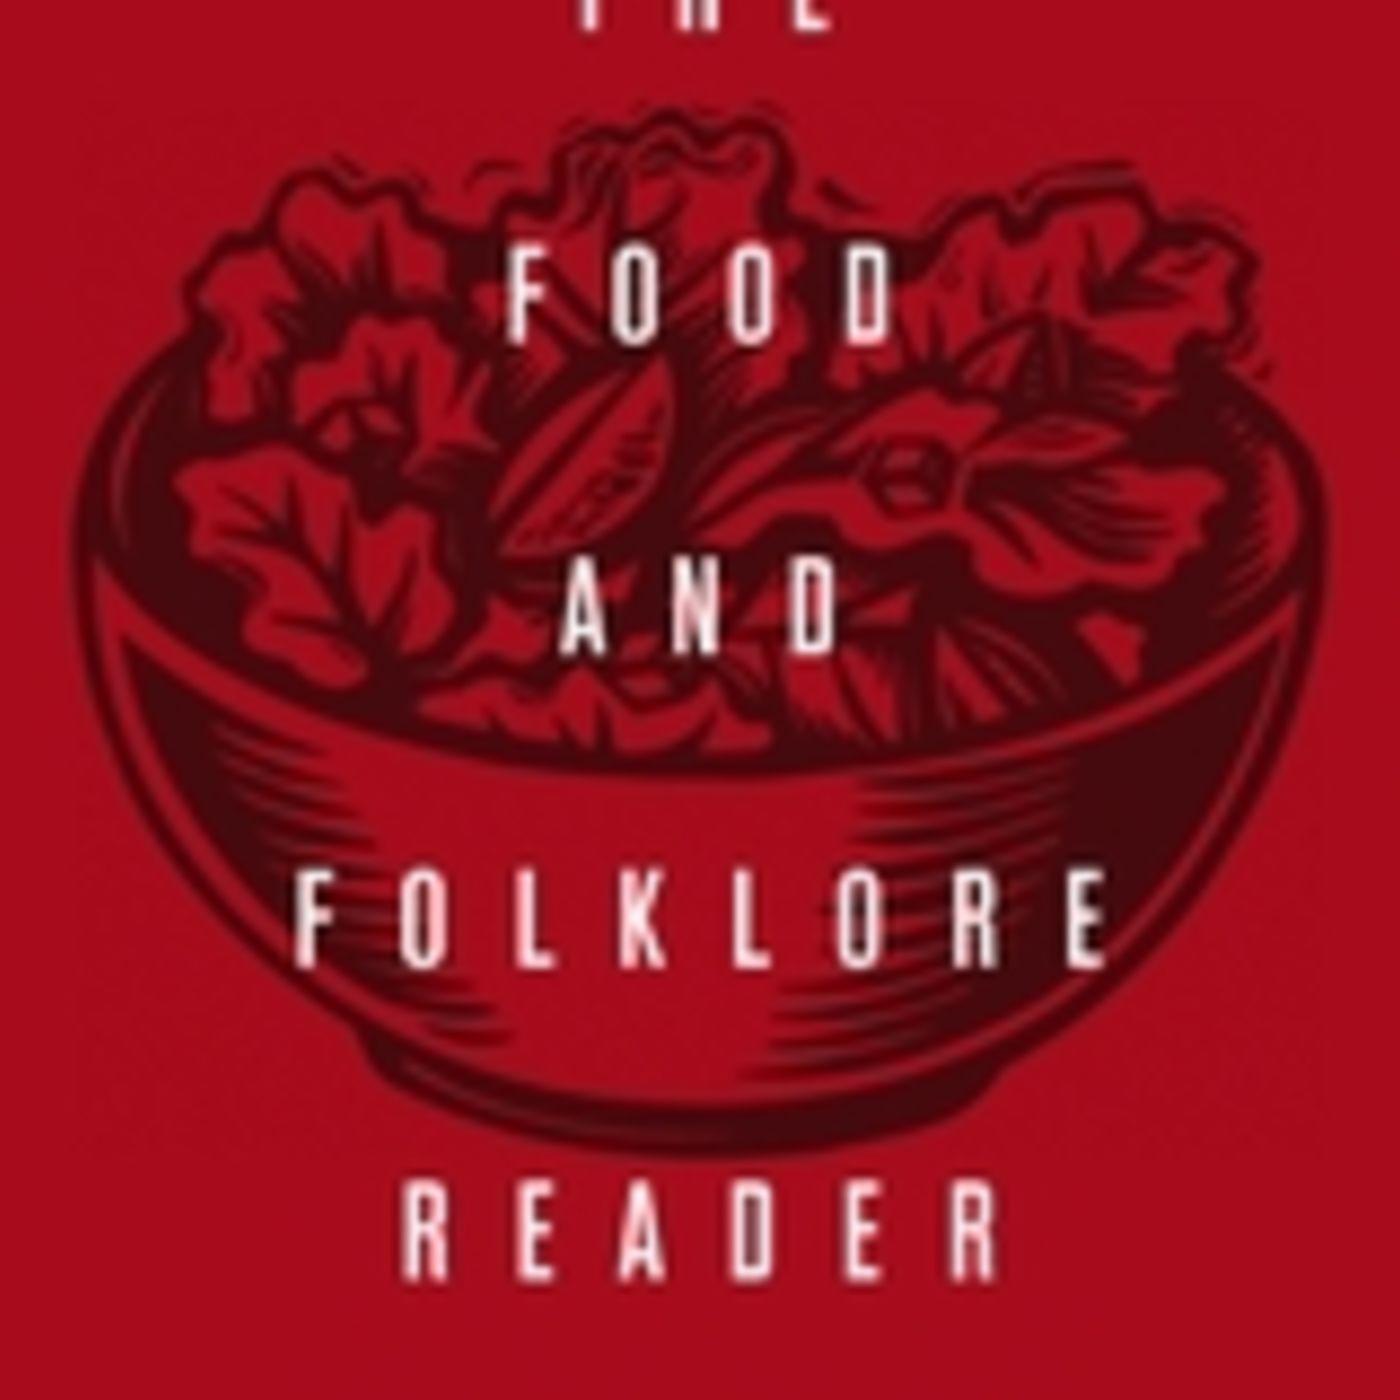 Episode 224: Folklore of Food